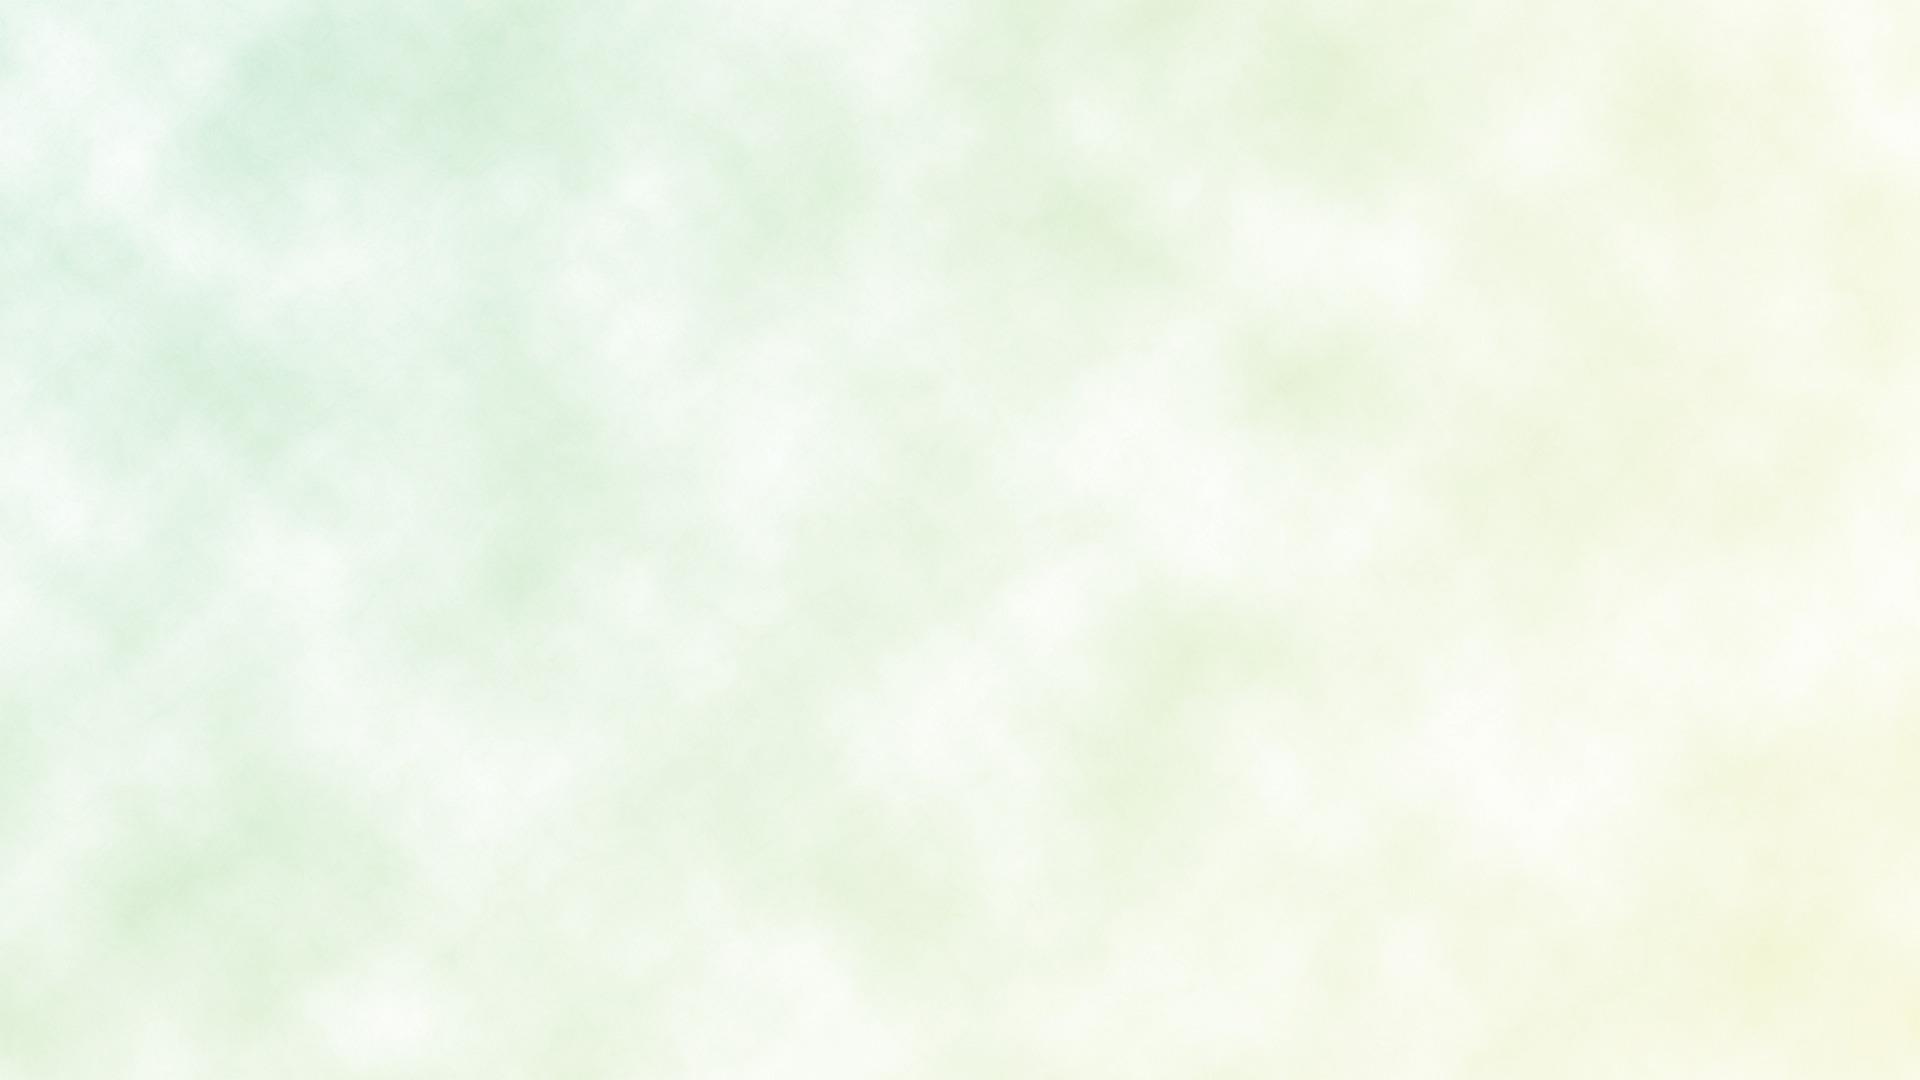 和紙風 壁紙背景画像_washi6